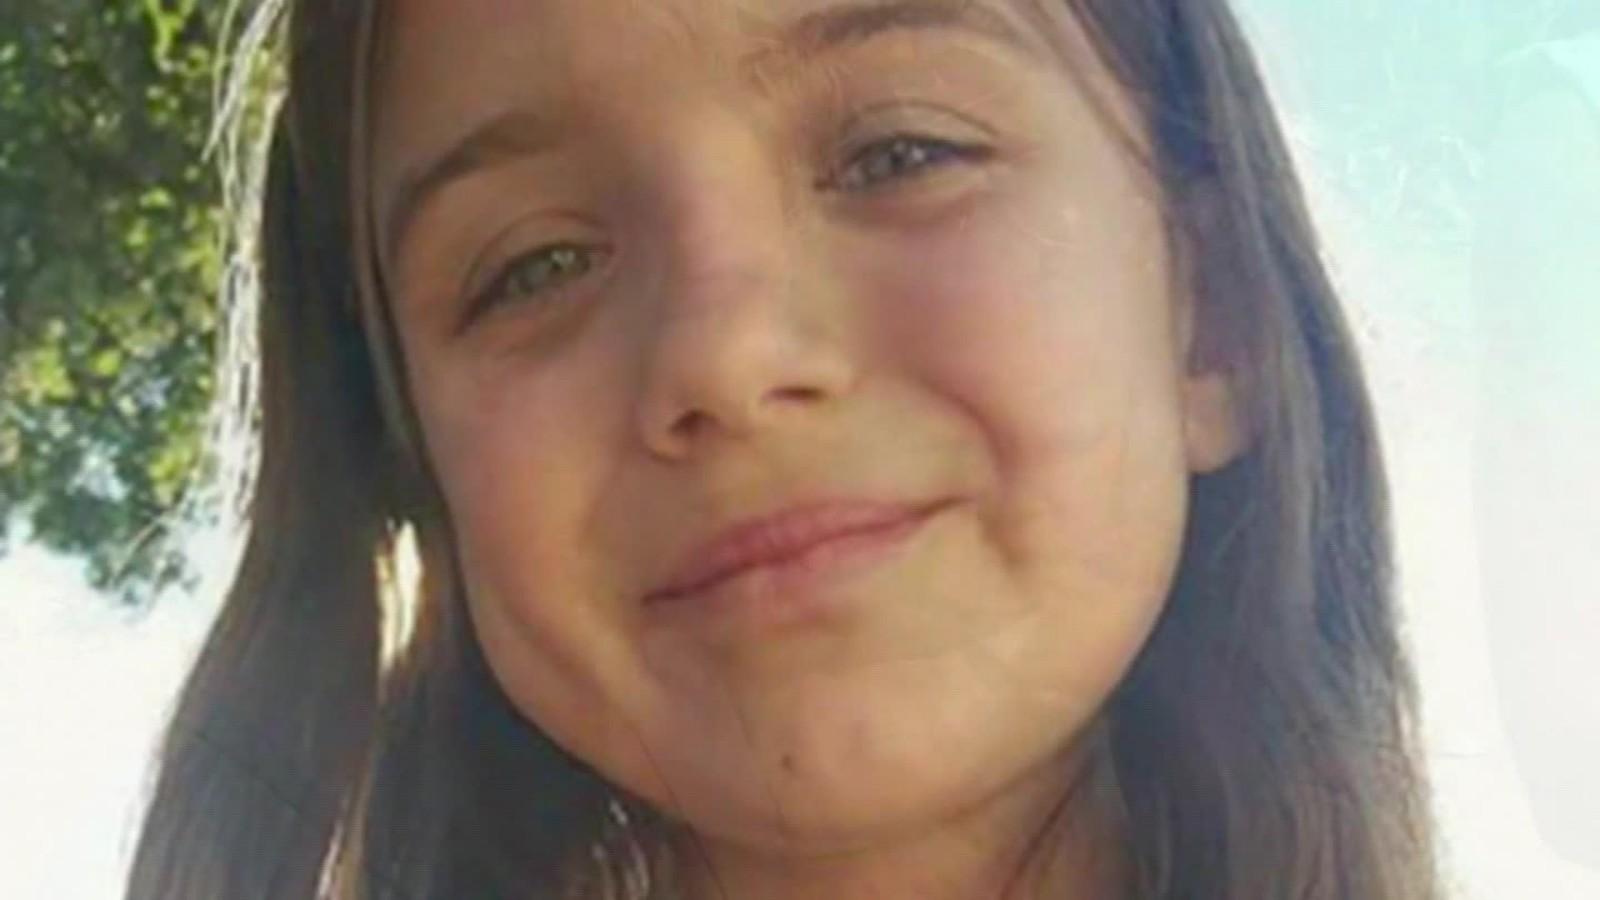 10-year-old killed saving playmates from runaway SUV - CNN Video